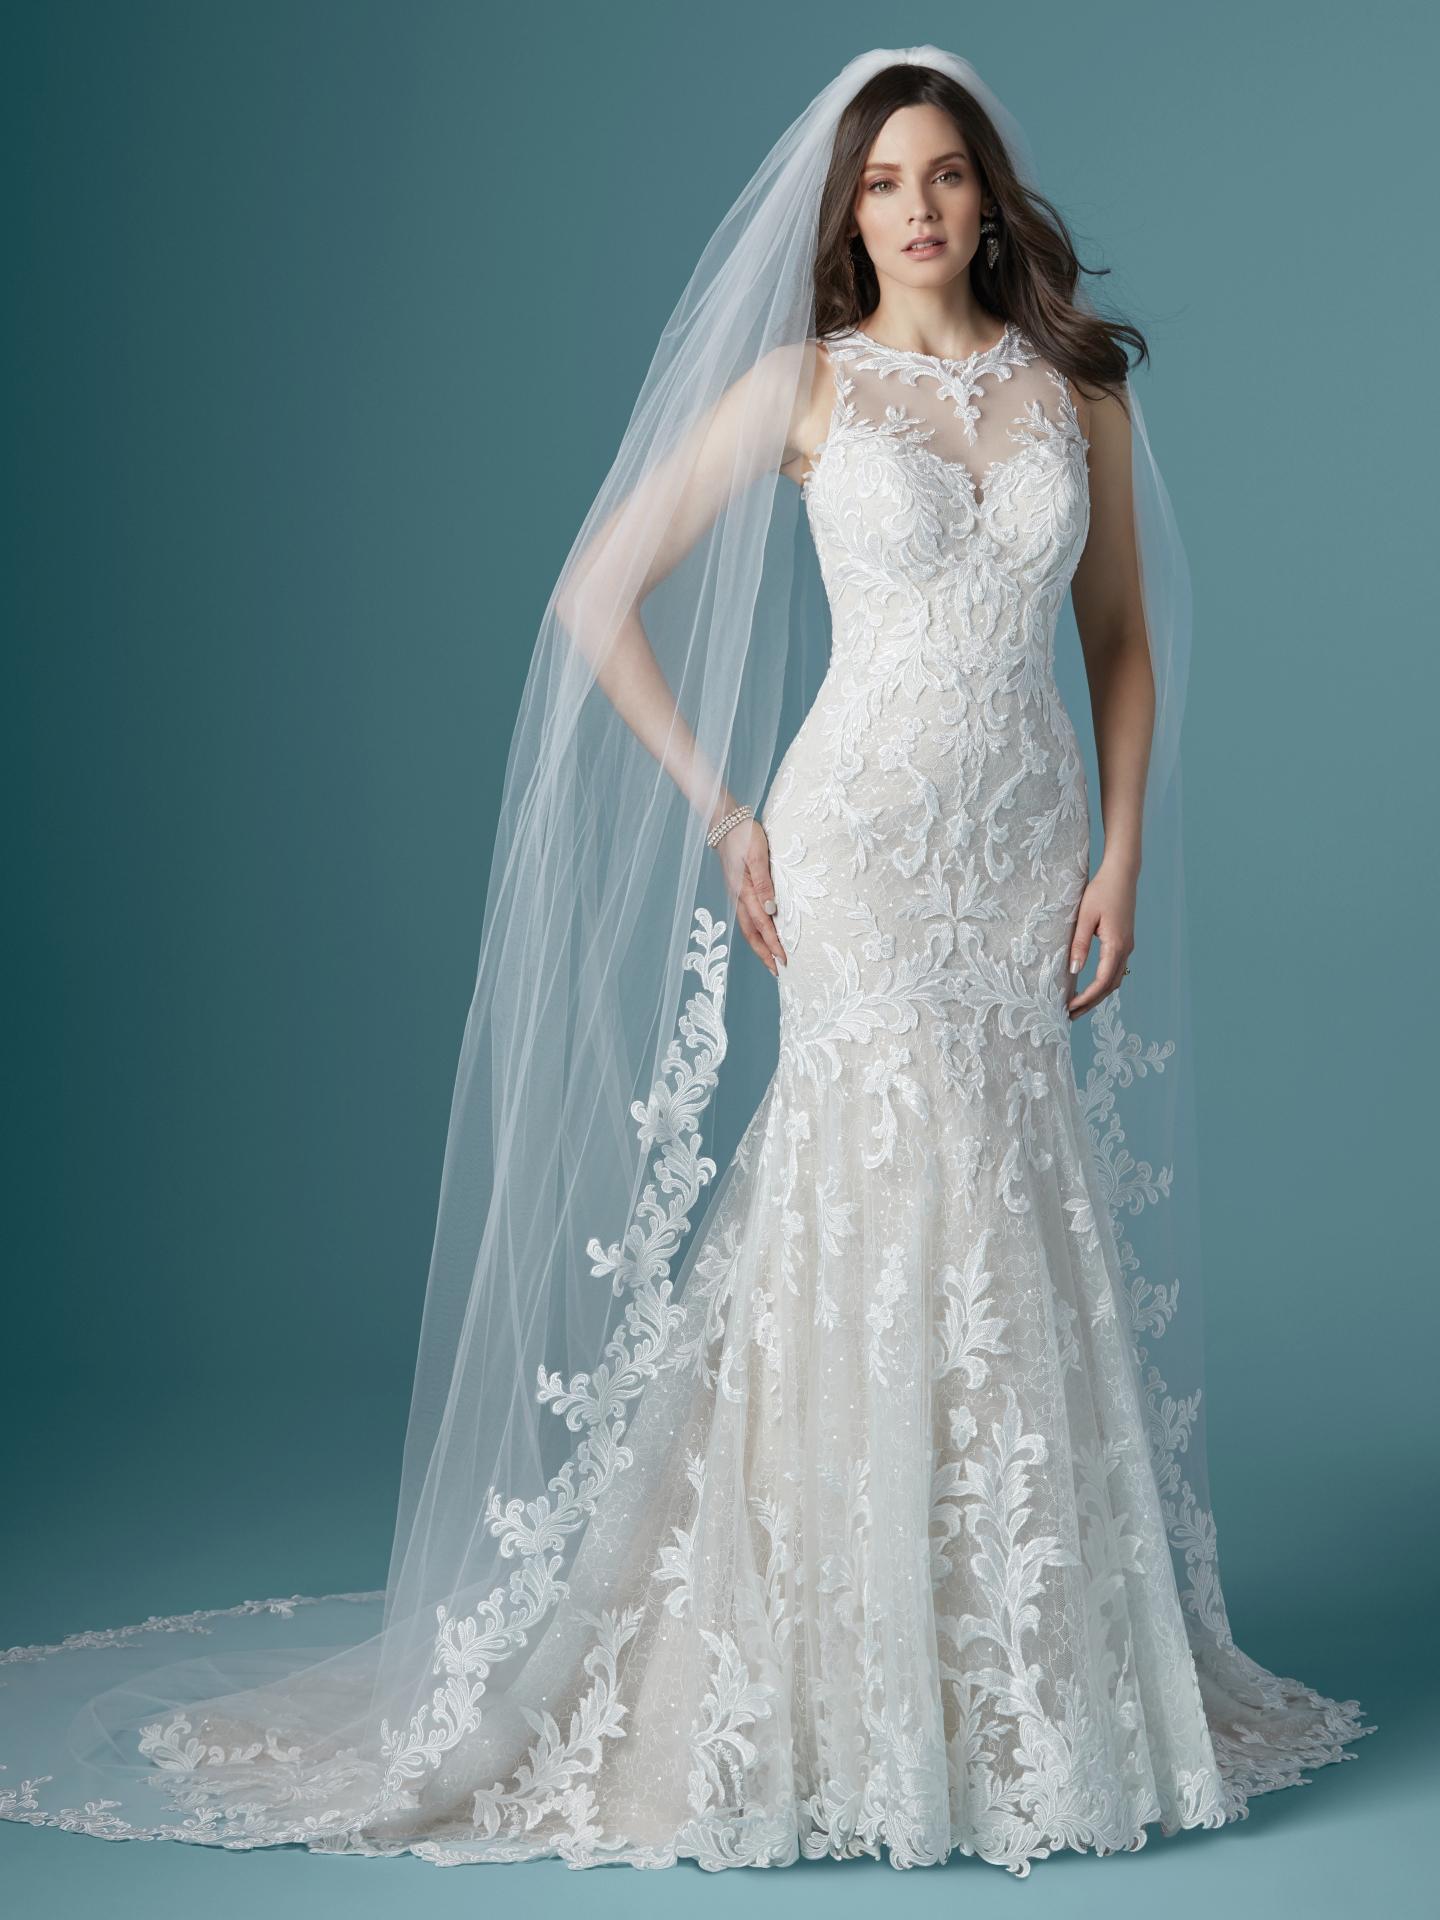 Leah Wedding Dress Bridal Gown Maggie Sottero